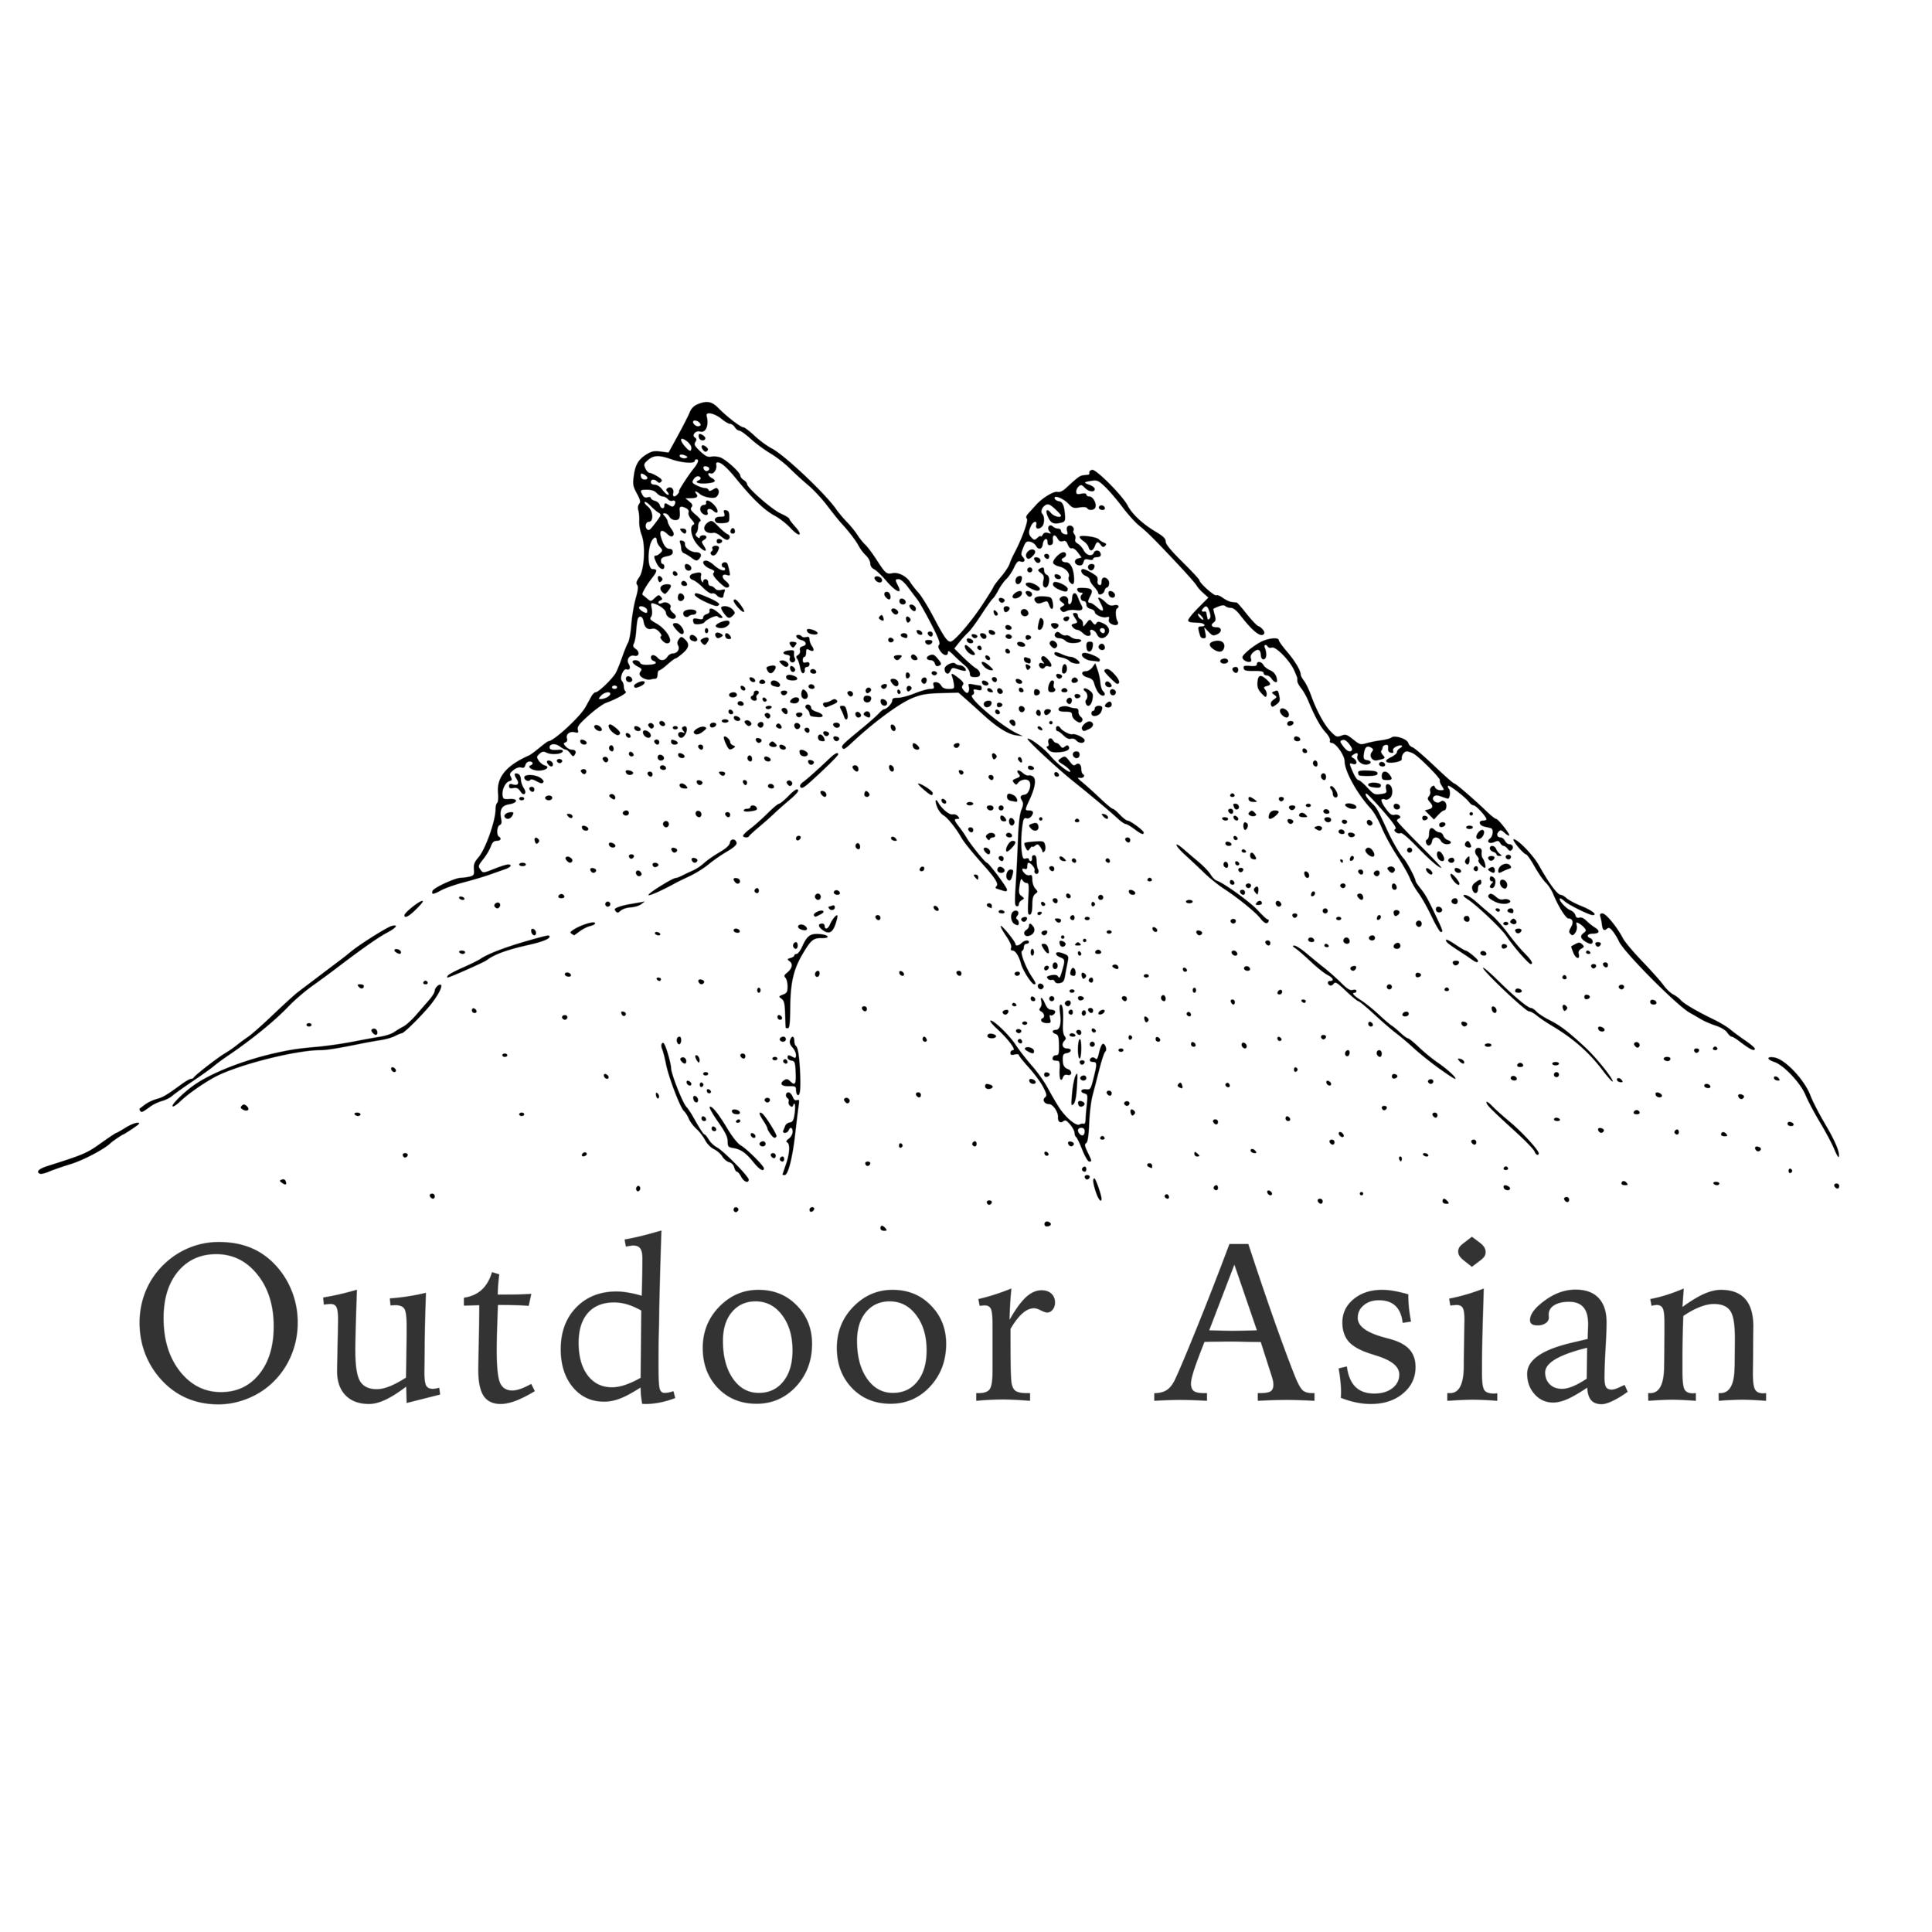 Outdoor Asian